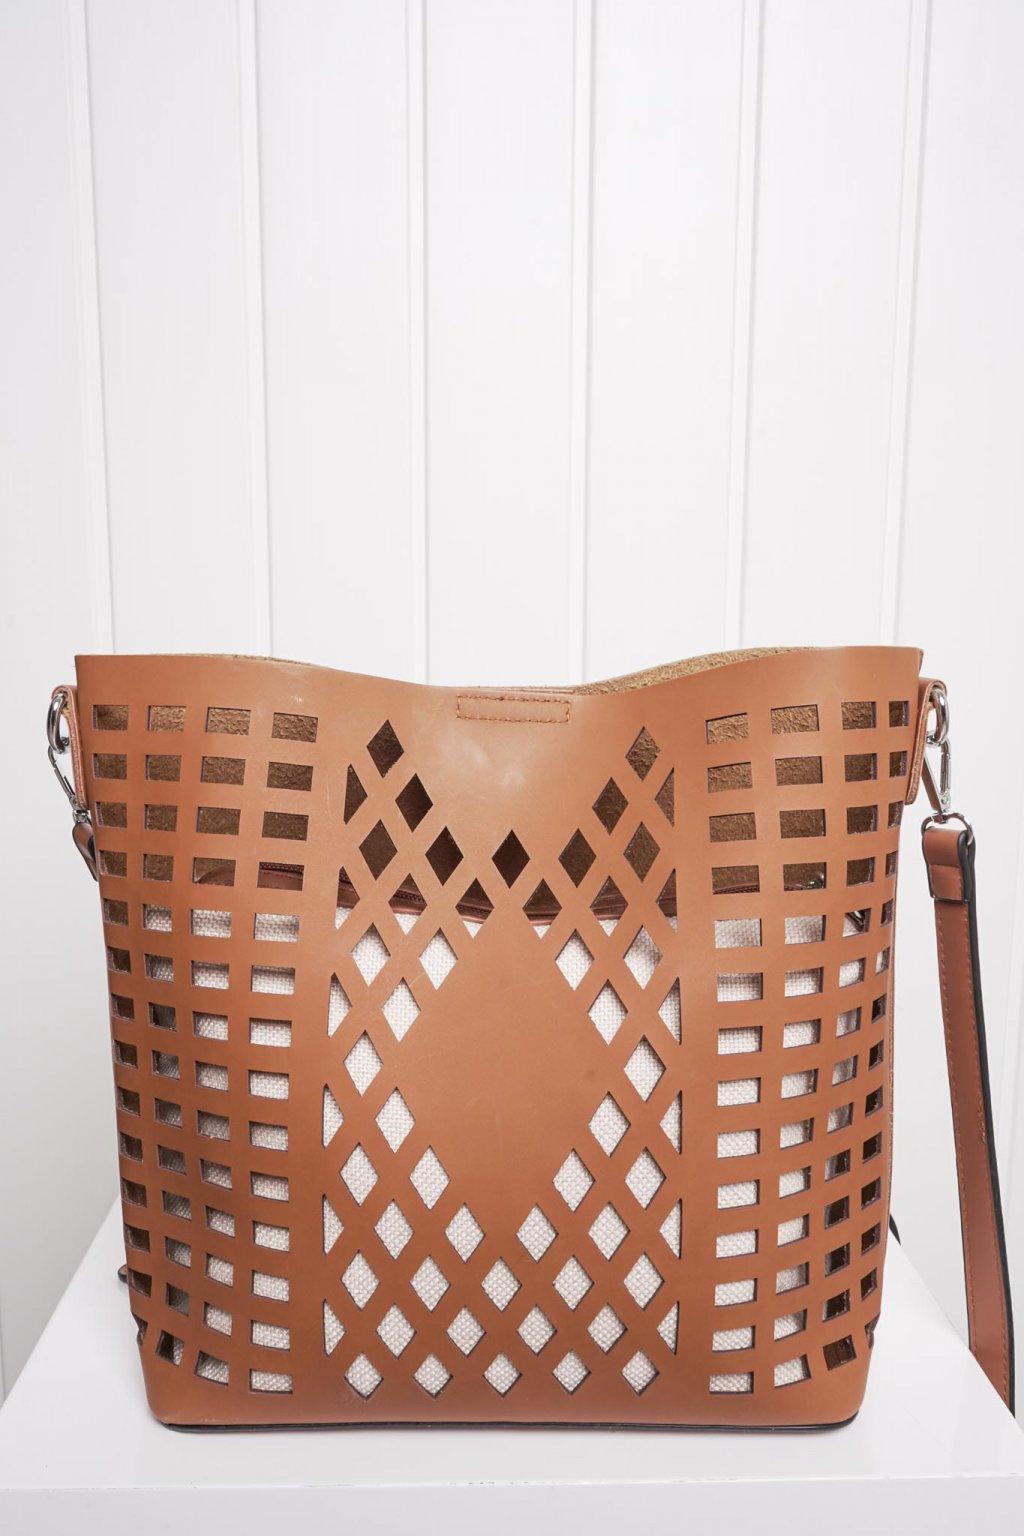 Kabelka, ruksak, dobrá cena, čierna kabelka, čierny ruksak, basic, kabelky, ruksaky 086